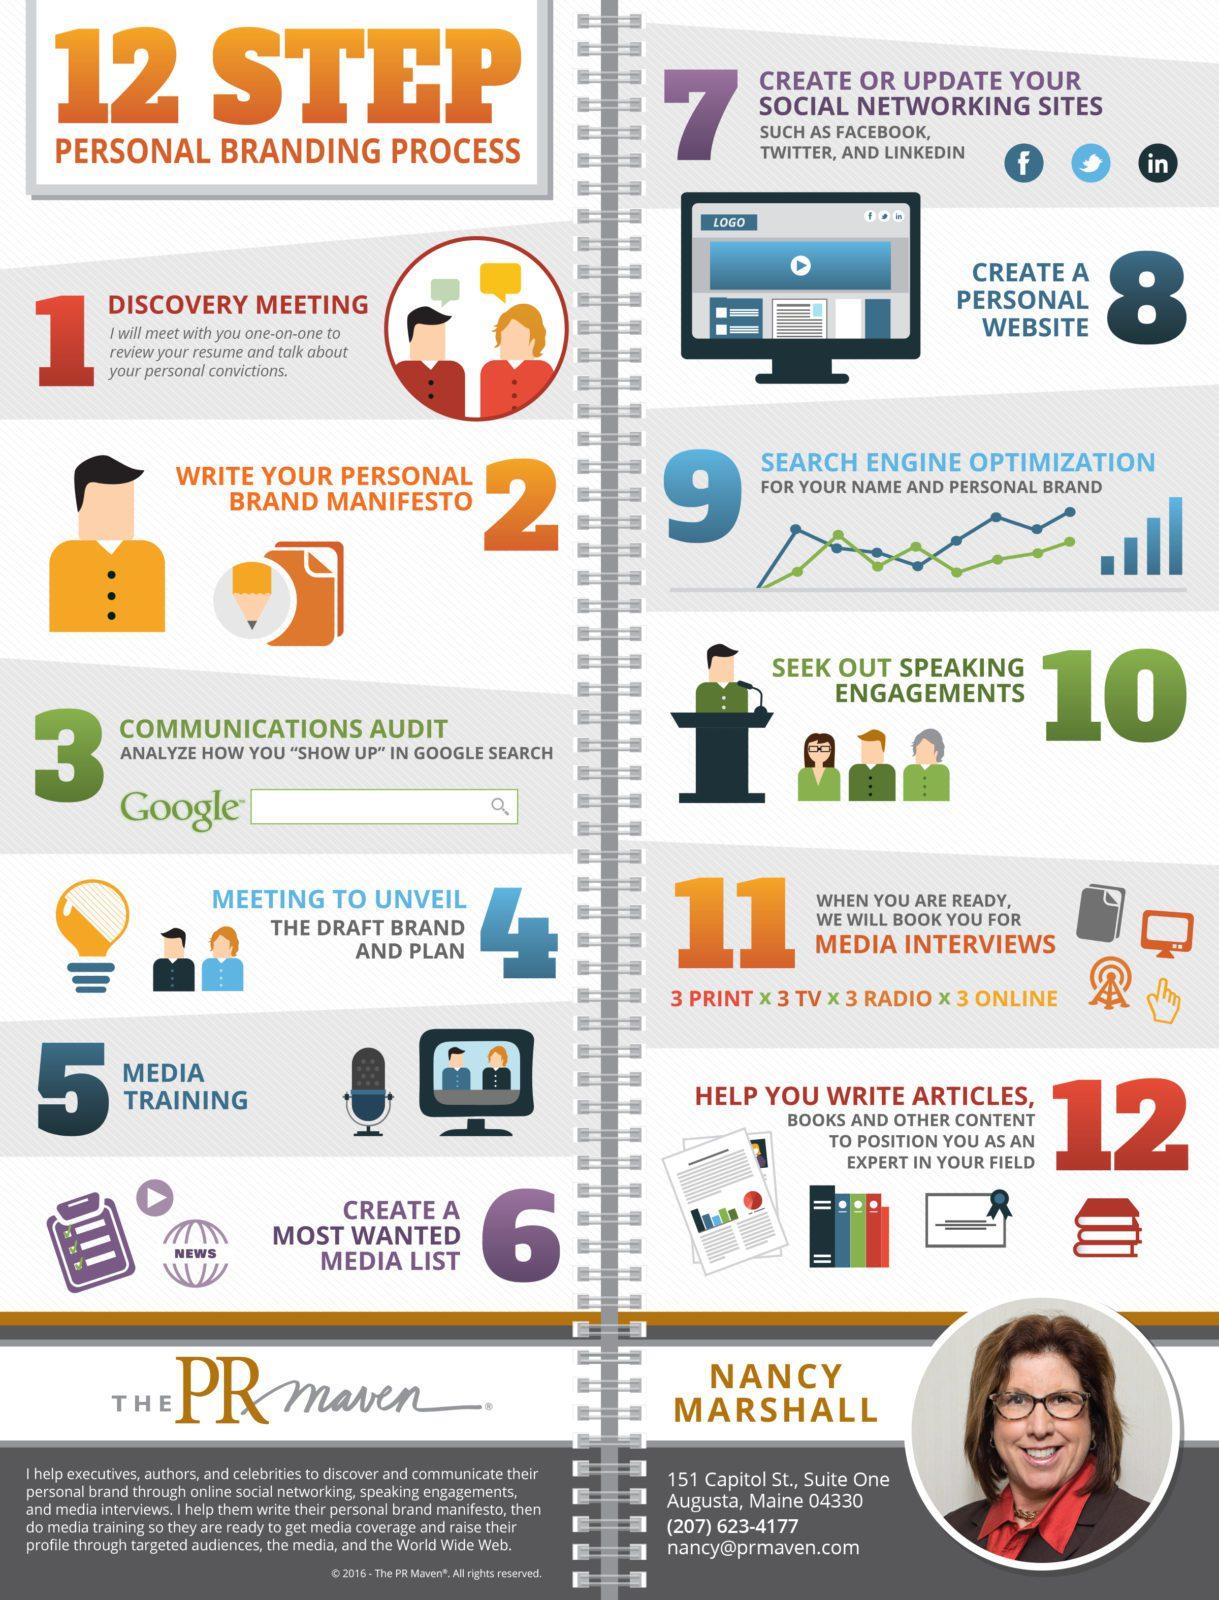 12 Step Personal Branding Process Personal Brand